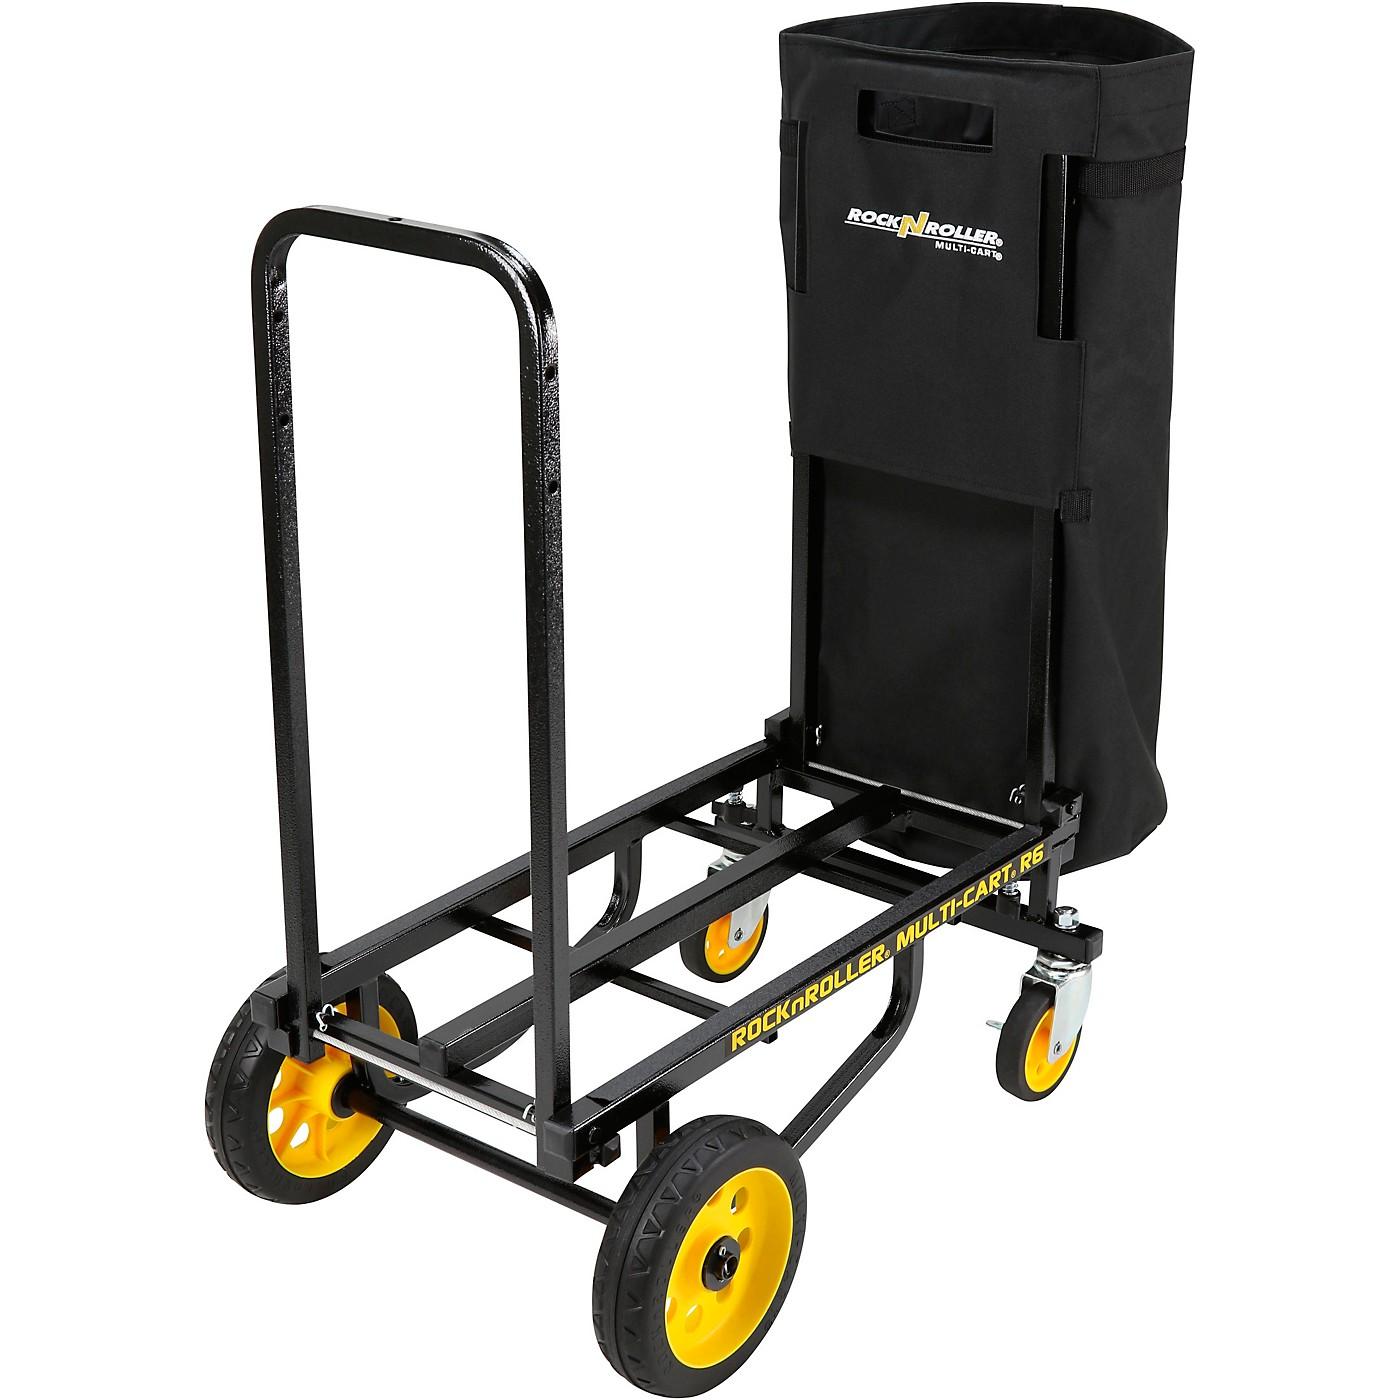 Rock N Roller RSA-HBR6 Handle Bag With Rigid Bottom (Fits R6 Carts) thumbnail